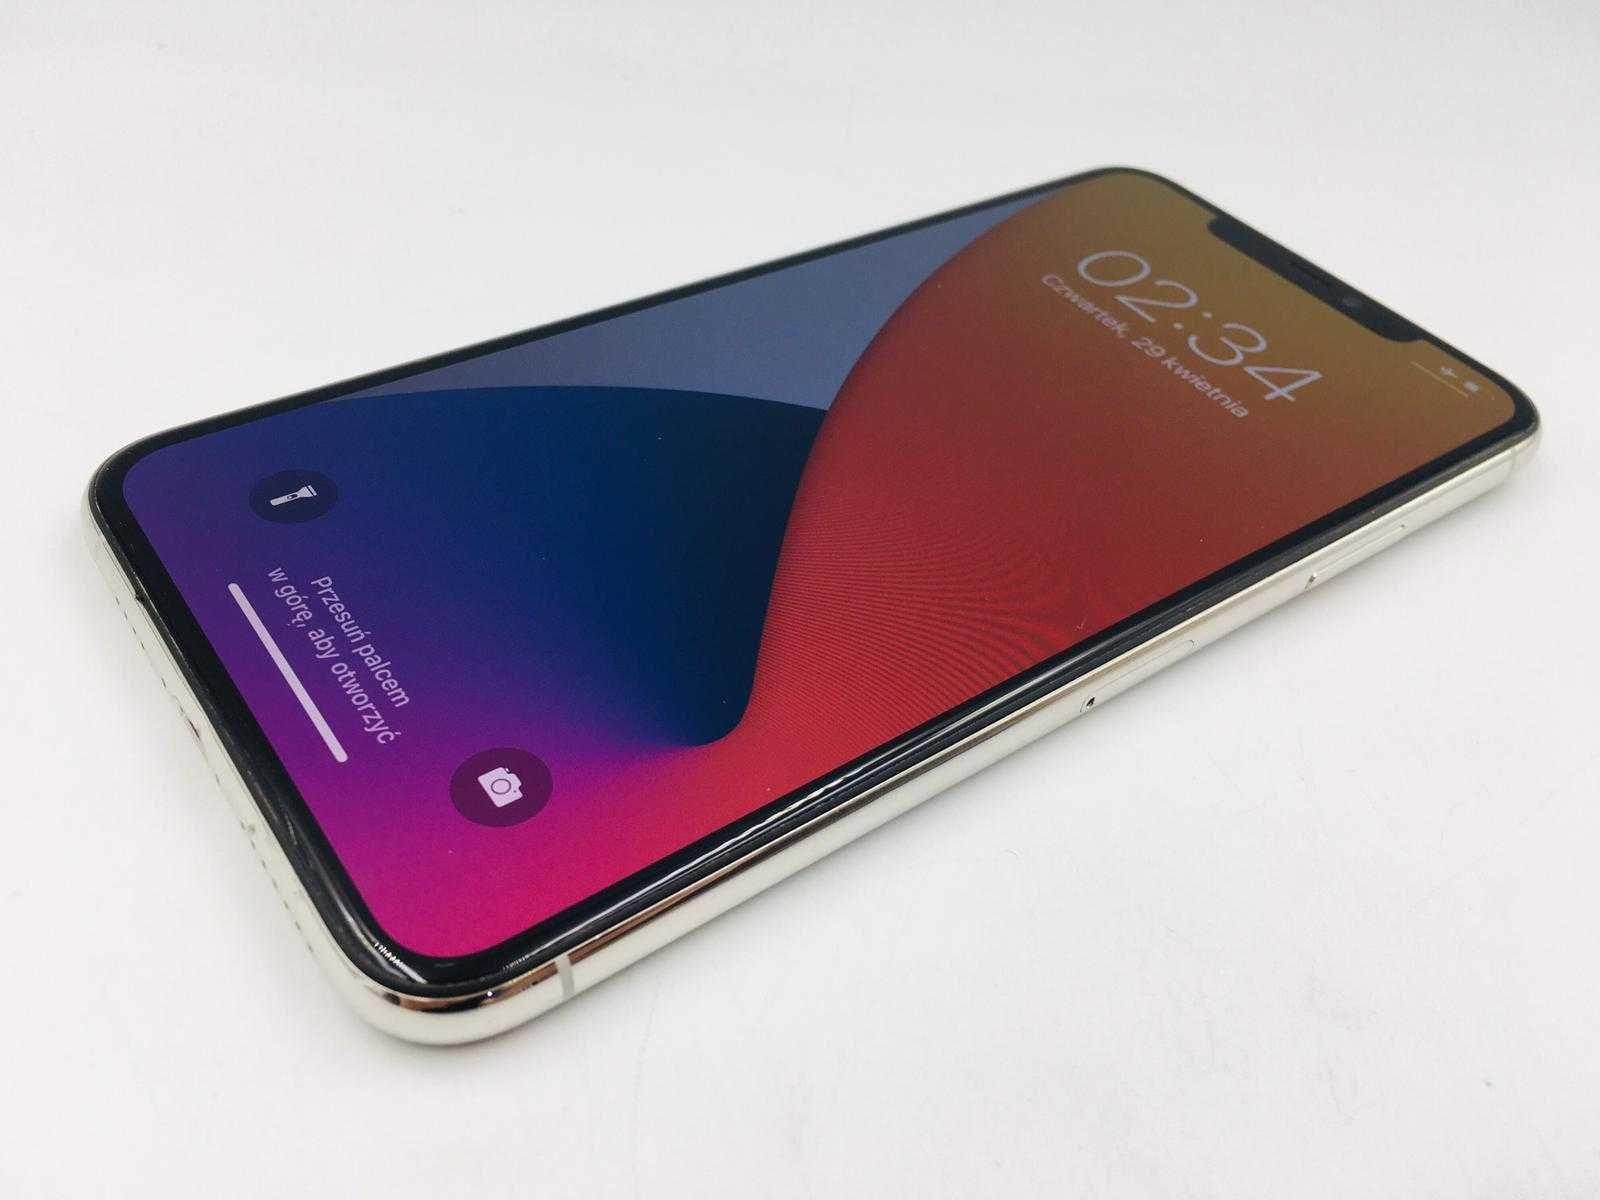 iPhone 11 PRO MAX 512GB / 256GB / 64GB • GWAR 12 msc • darmowa wysyłka